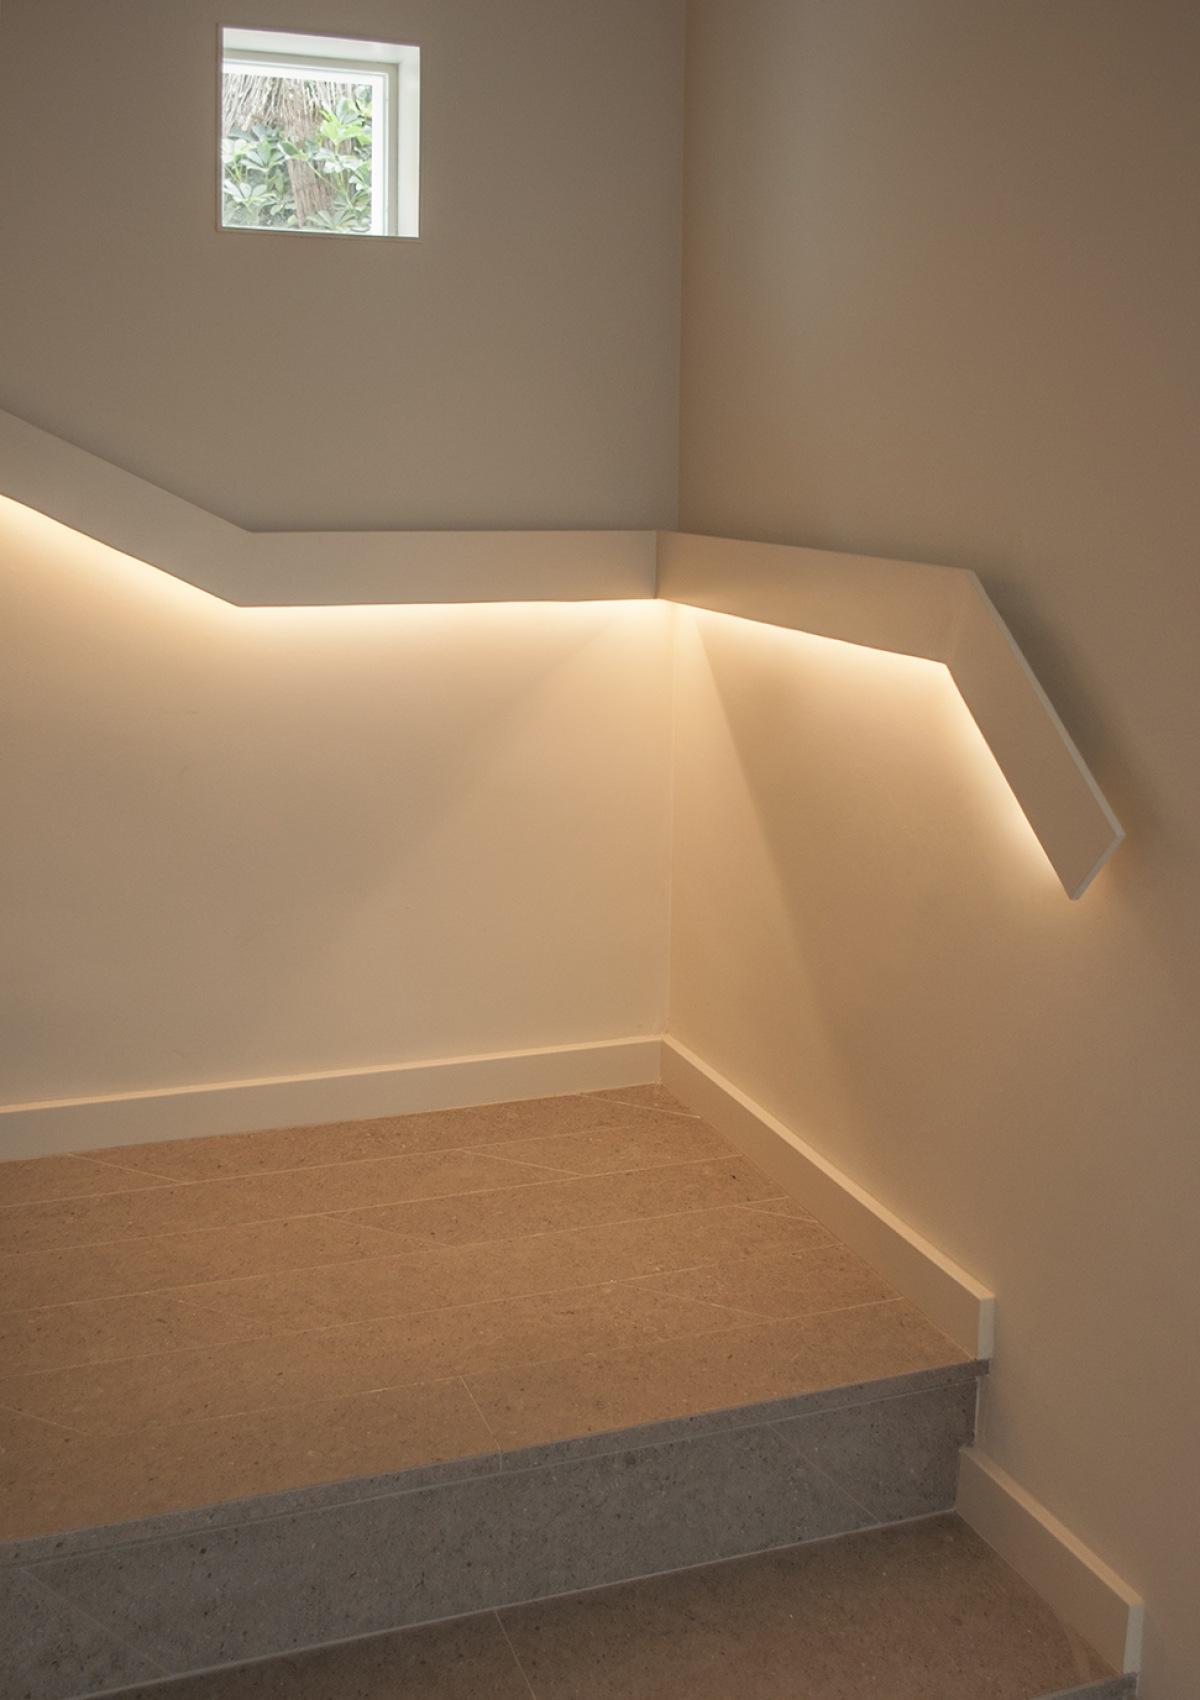 7-architecture-sitges-interior-design-barcelona-stairs-modern-lights-pavement